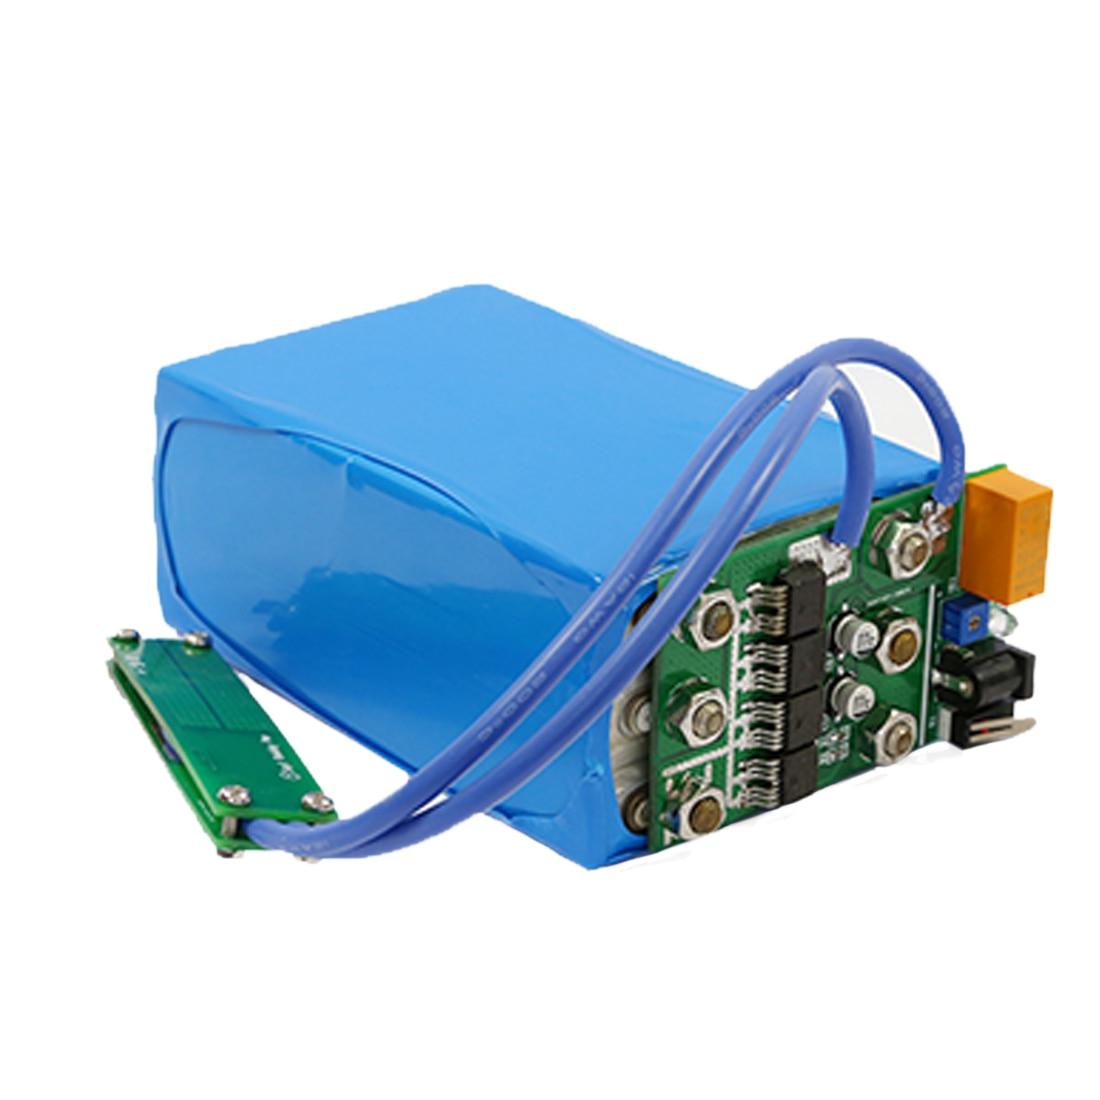 DIY Portable Spot Welder Lithium Battery Powered Spot Welder Programming Toy Parts